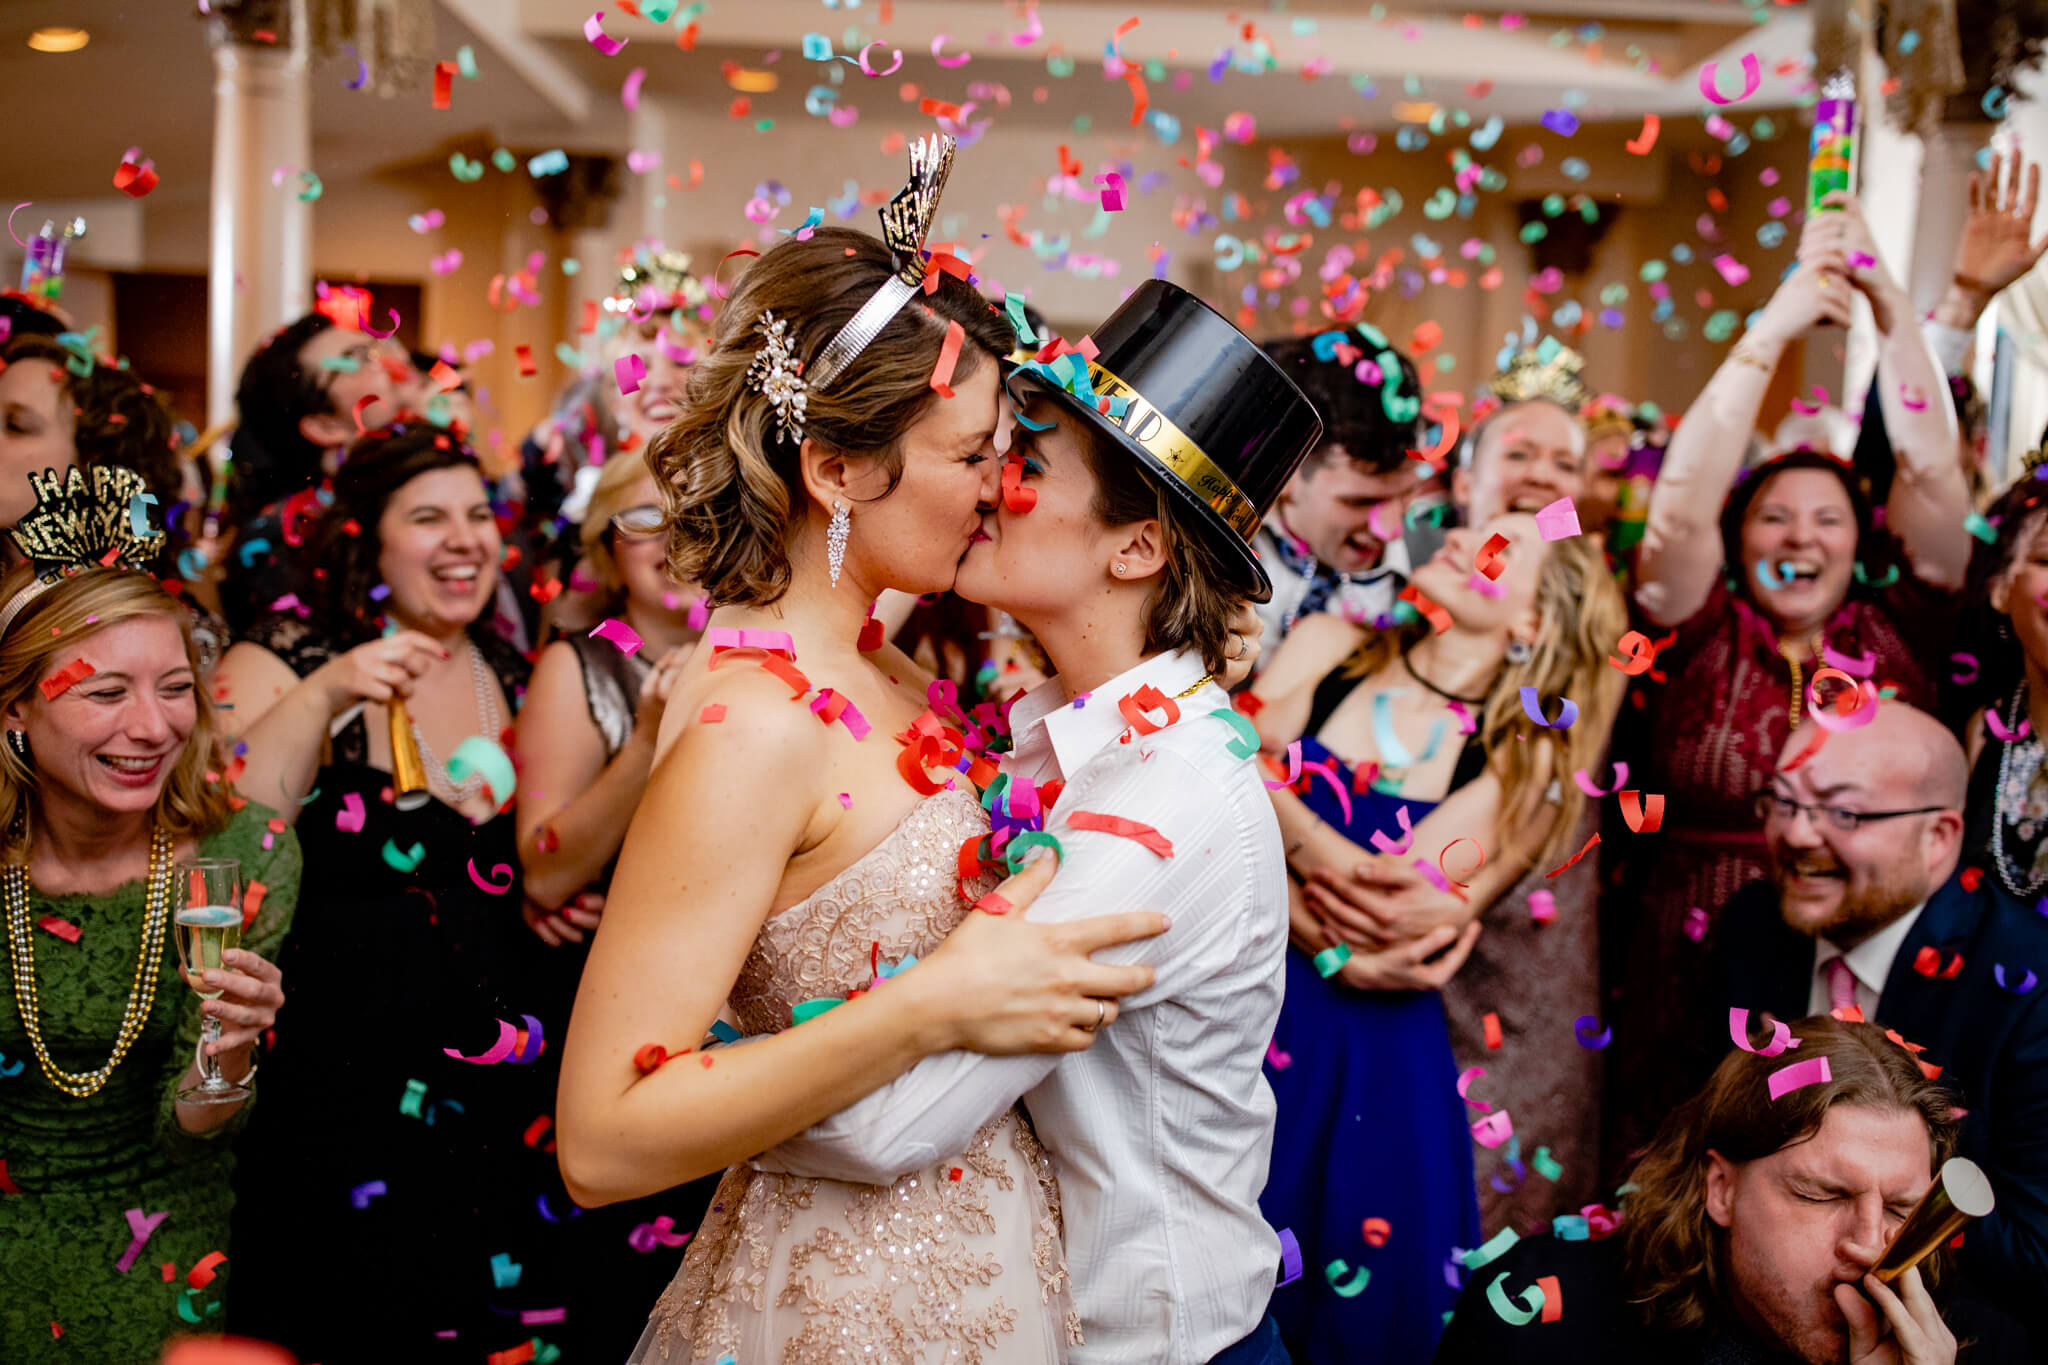 Melissa Jill New Years Eve 2017 Ceresville Mansion Confetti Celebration NYE1.jpg